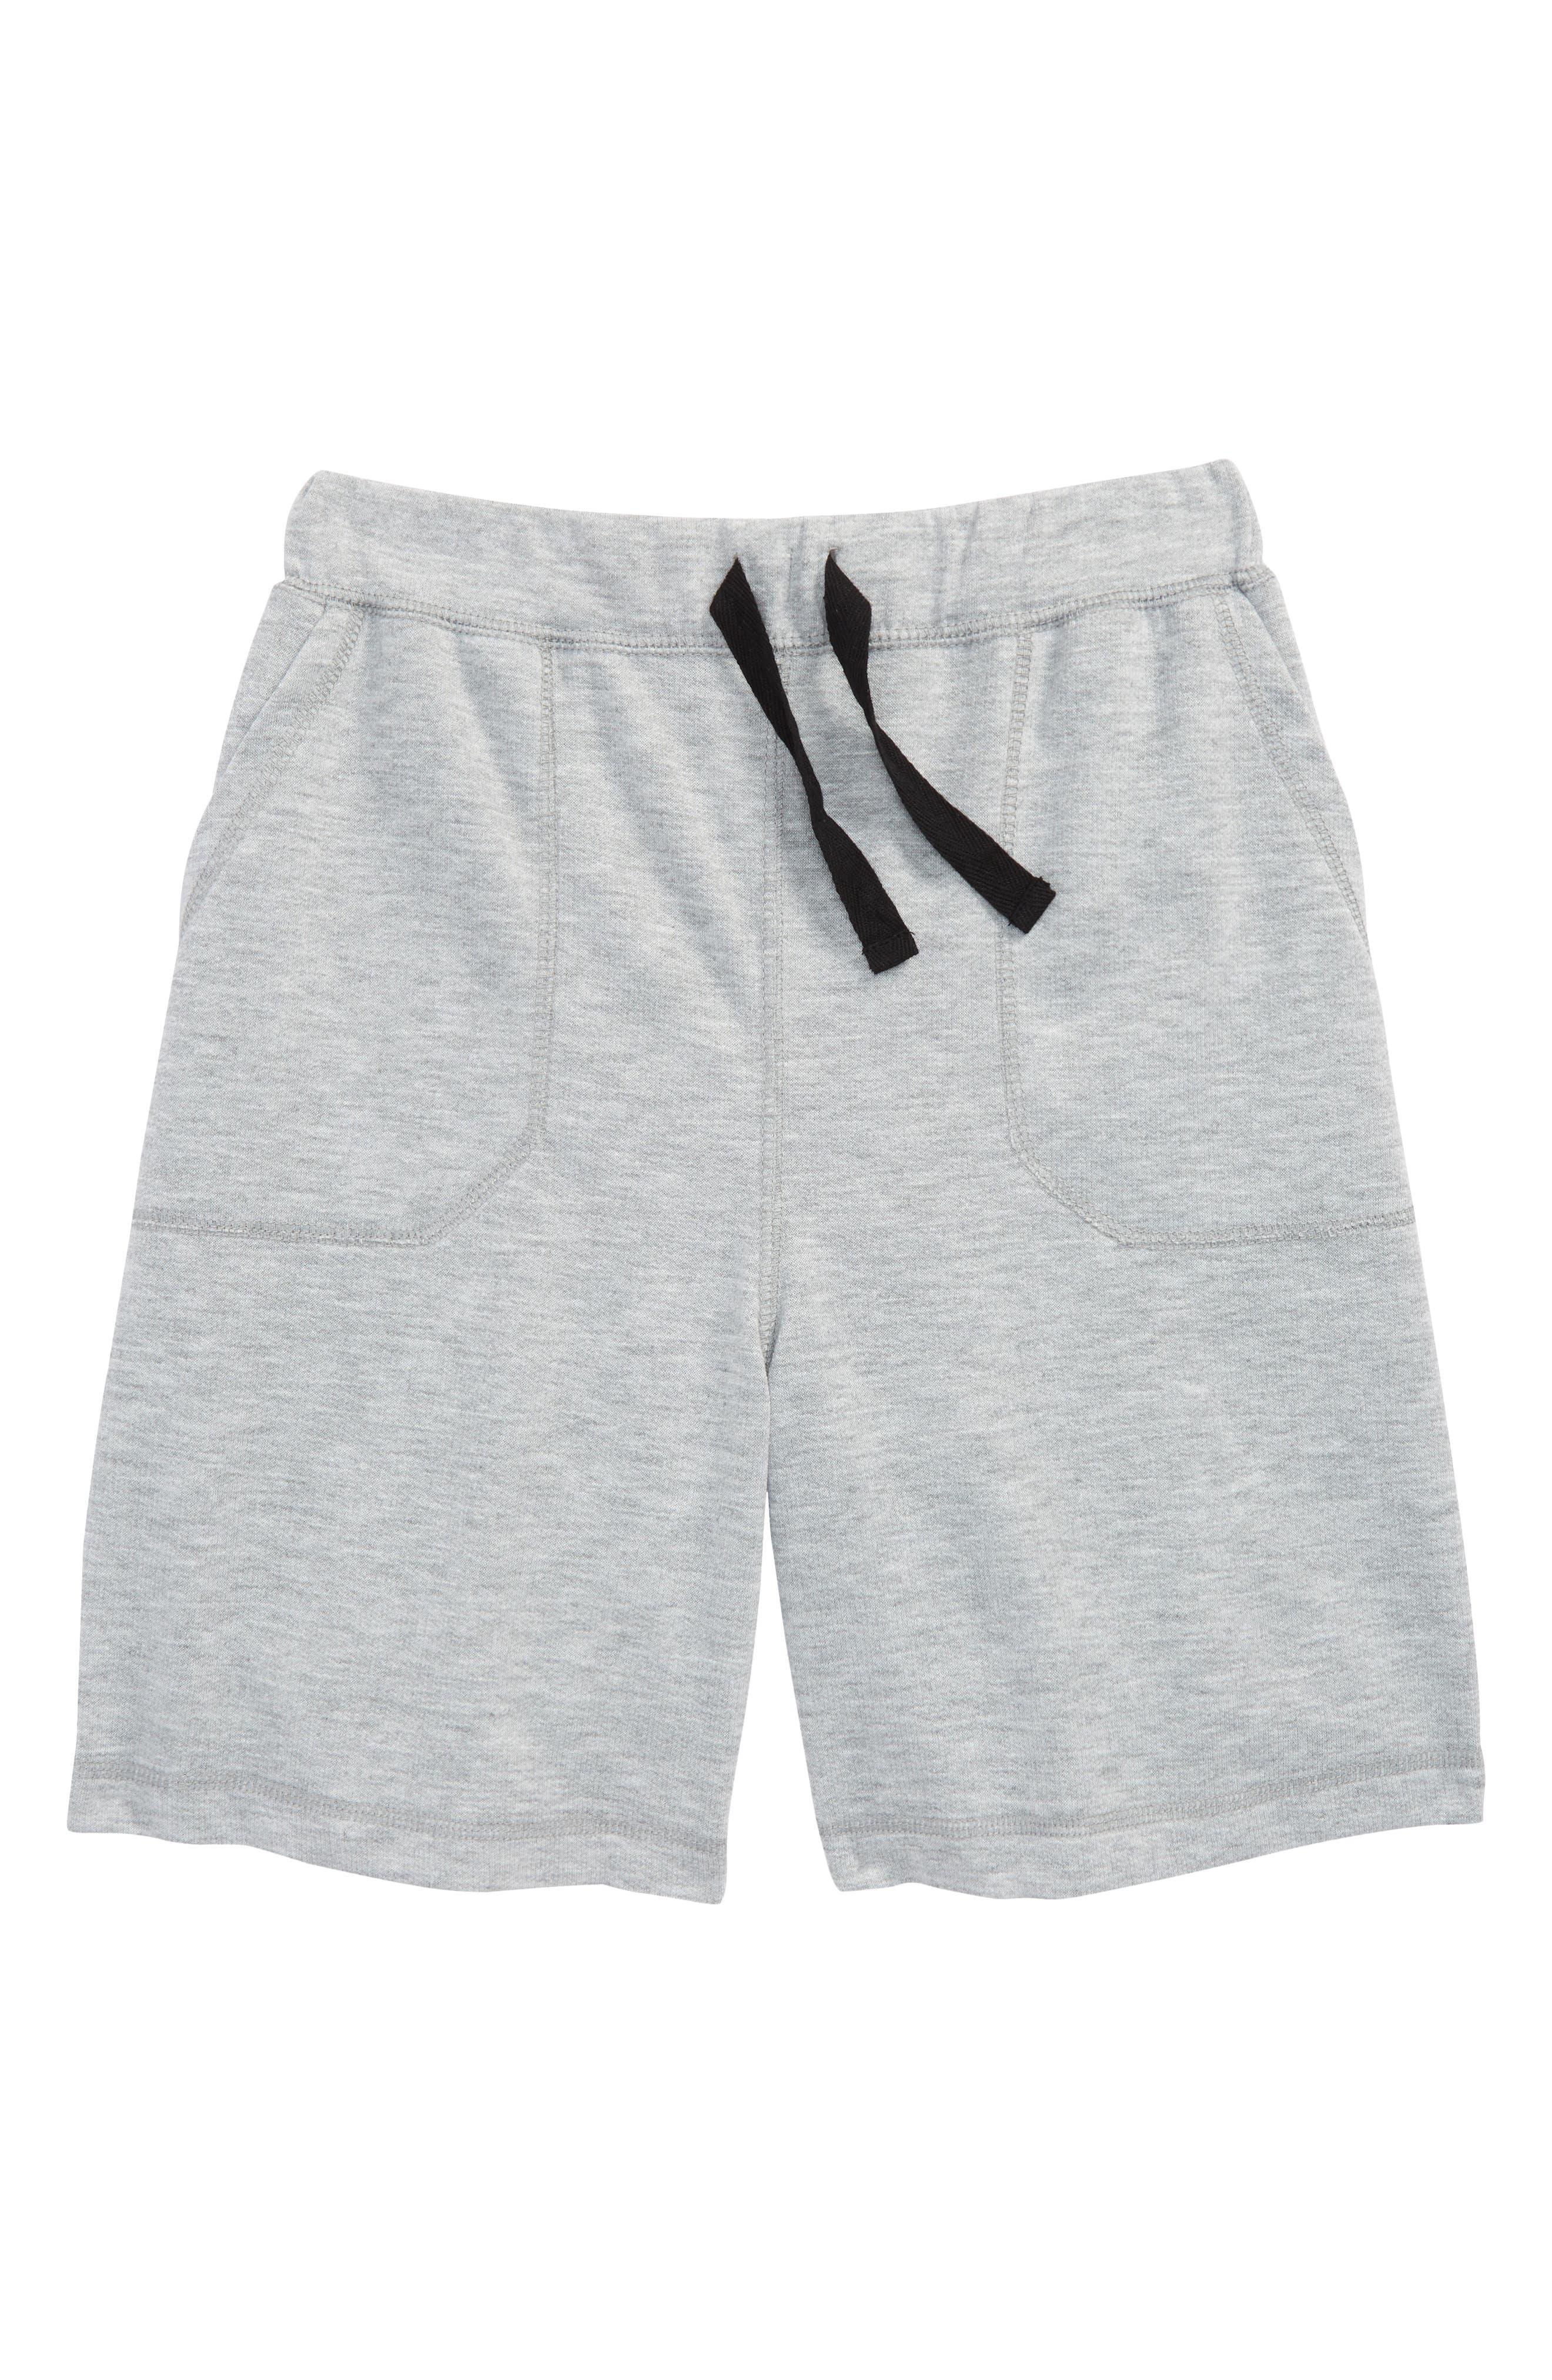 Soft Sleep Shorts,                             Main thumbnail 1, color,                             Grey Medium Heather